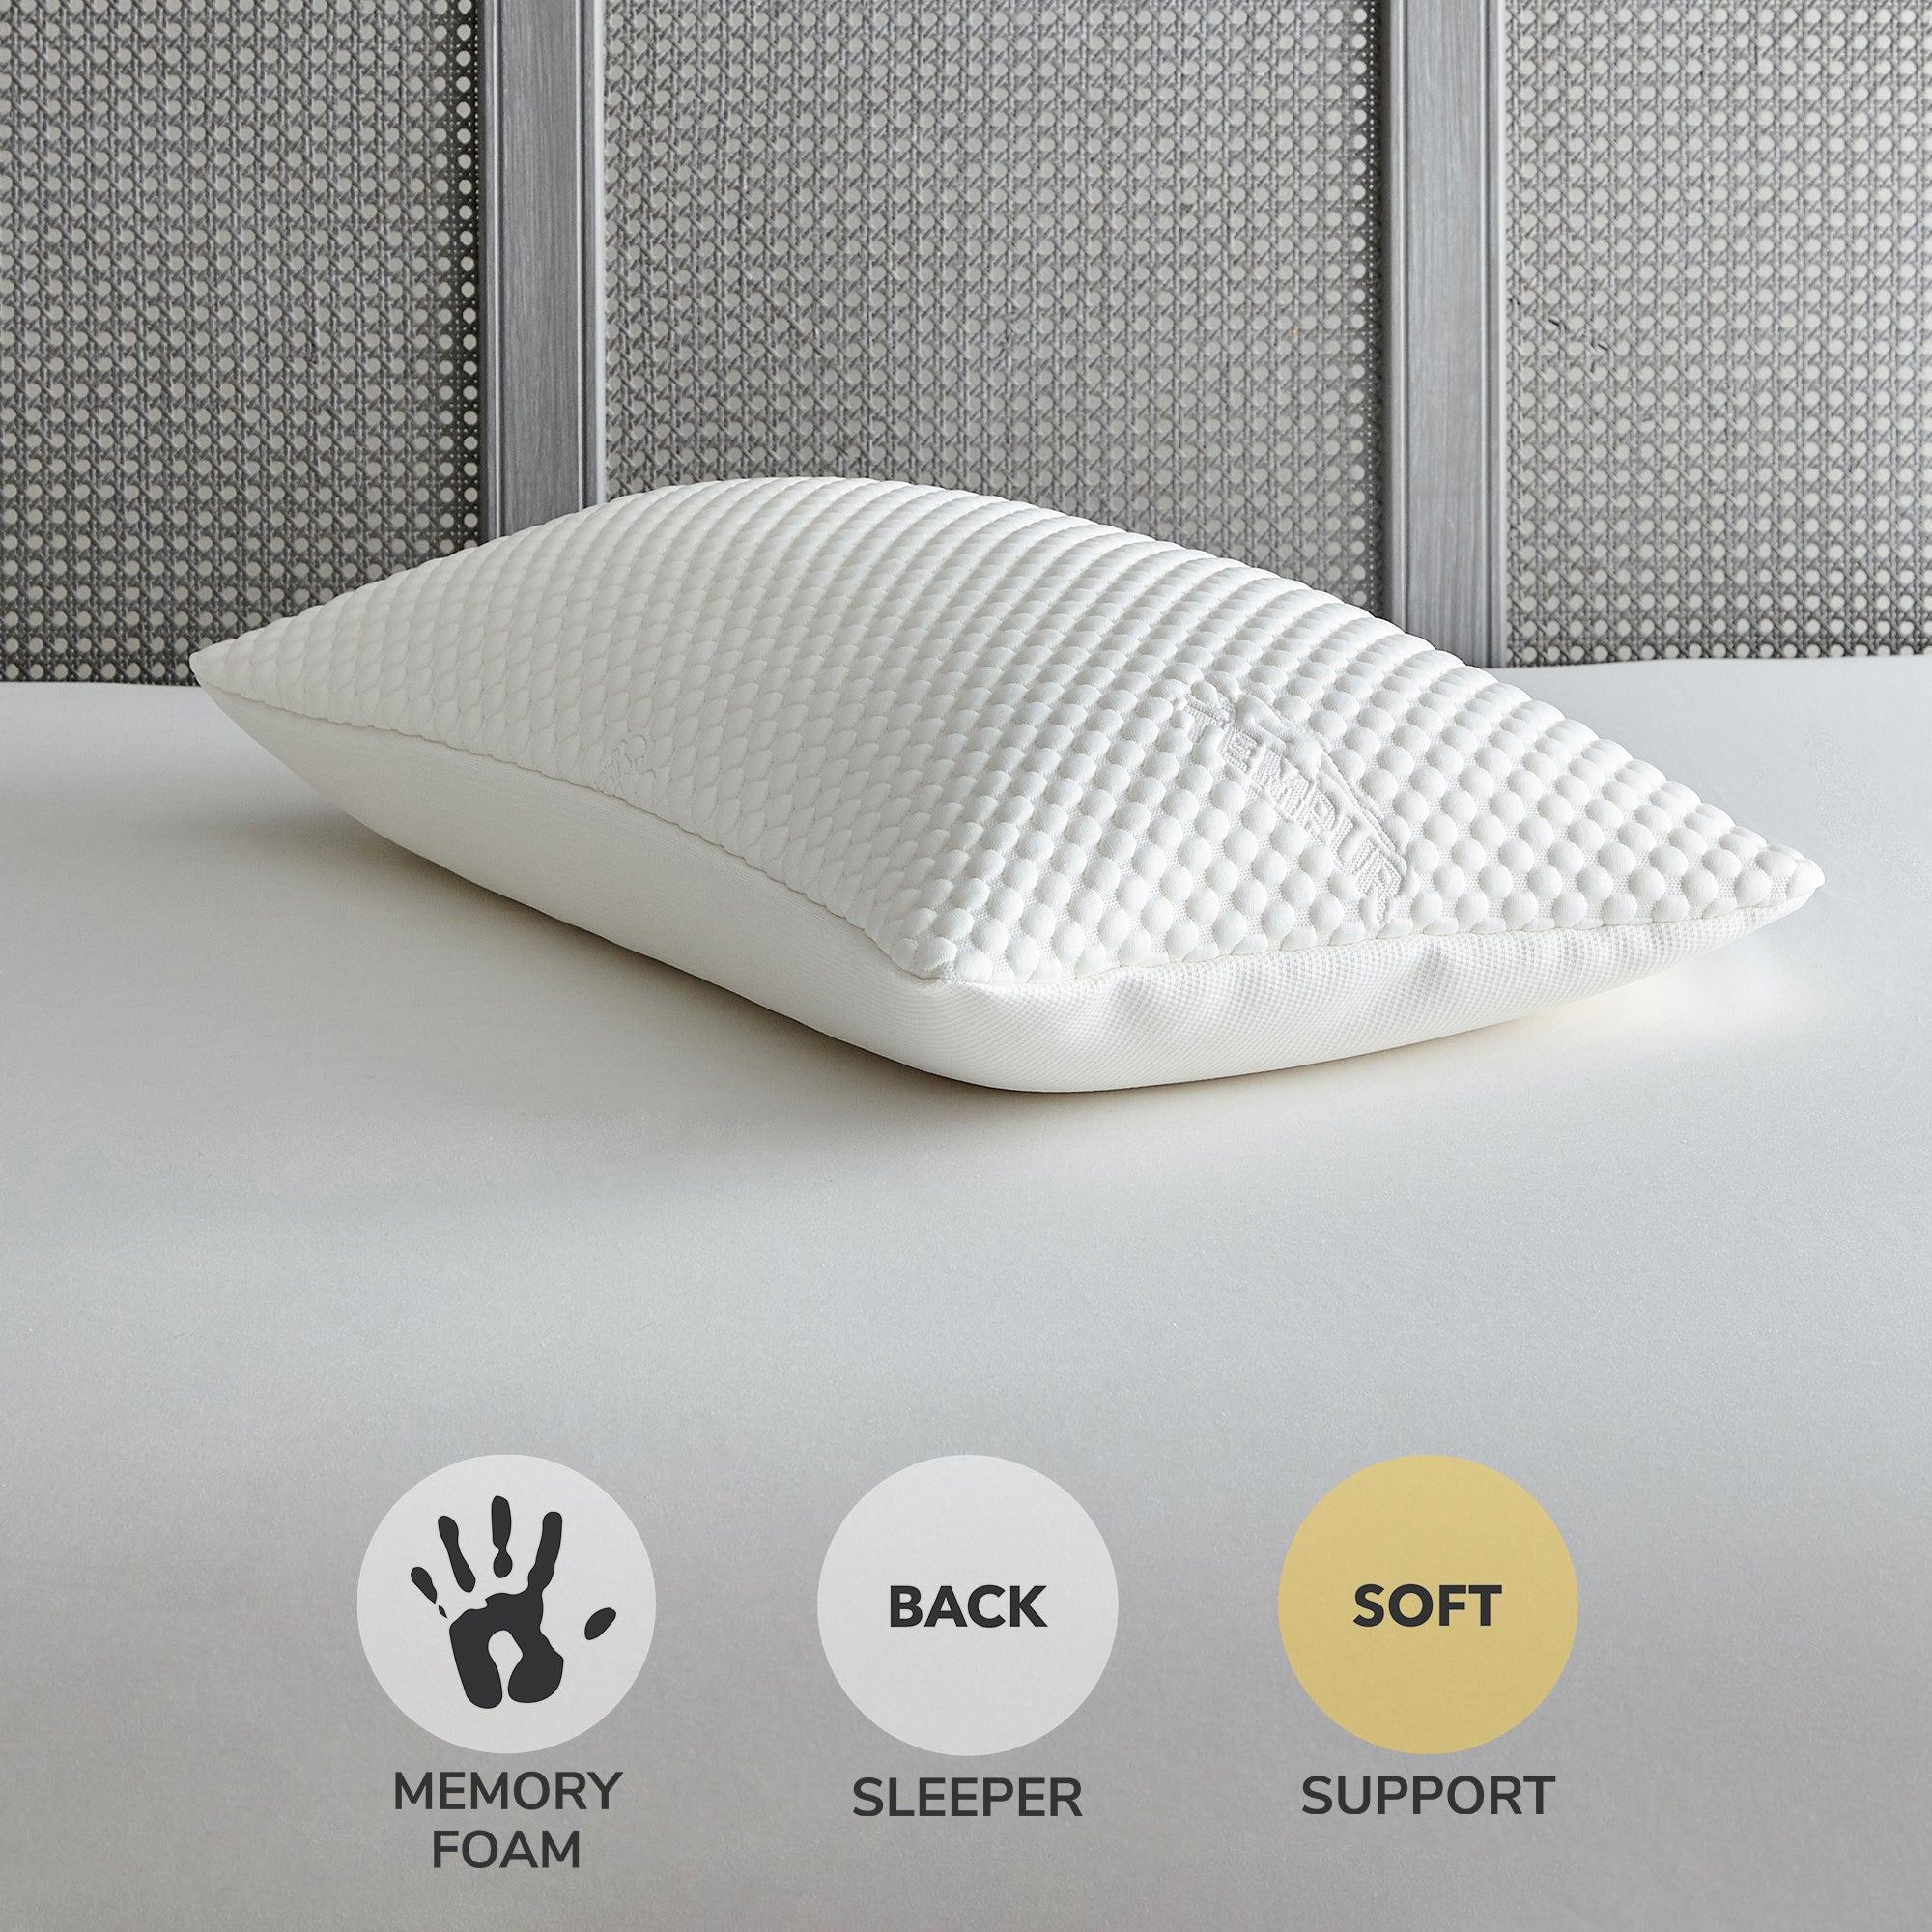 Image of Tempur Cloud Medium-Support Pillow White